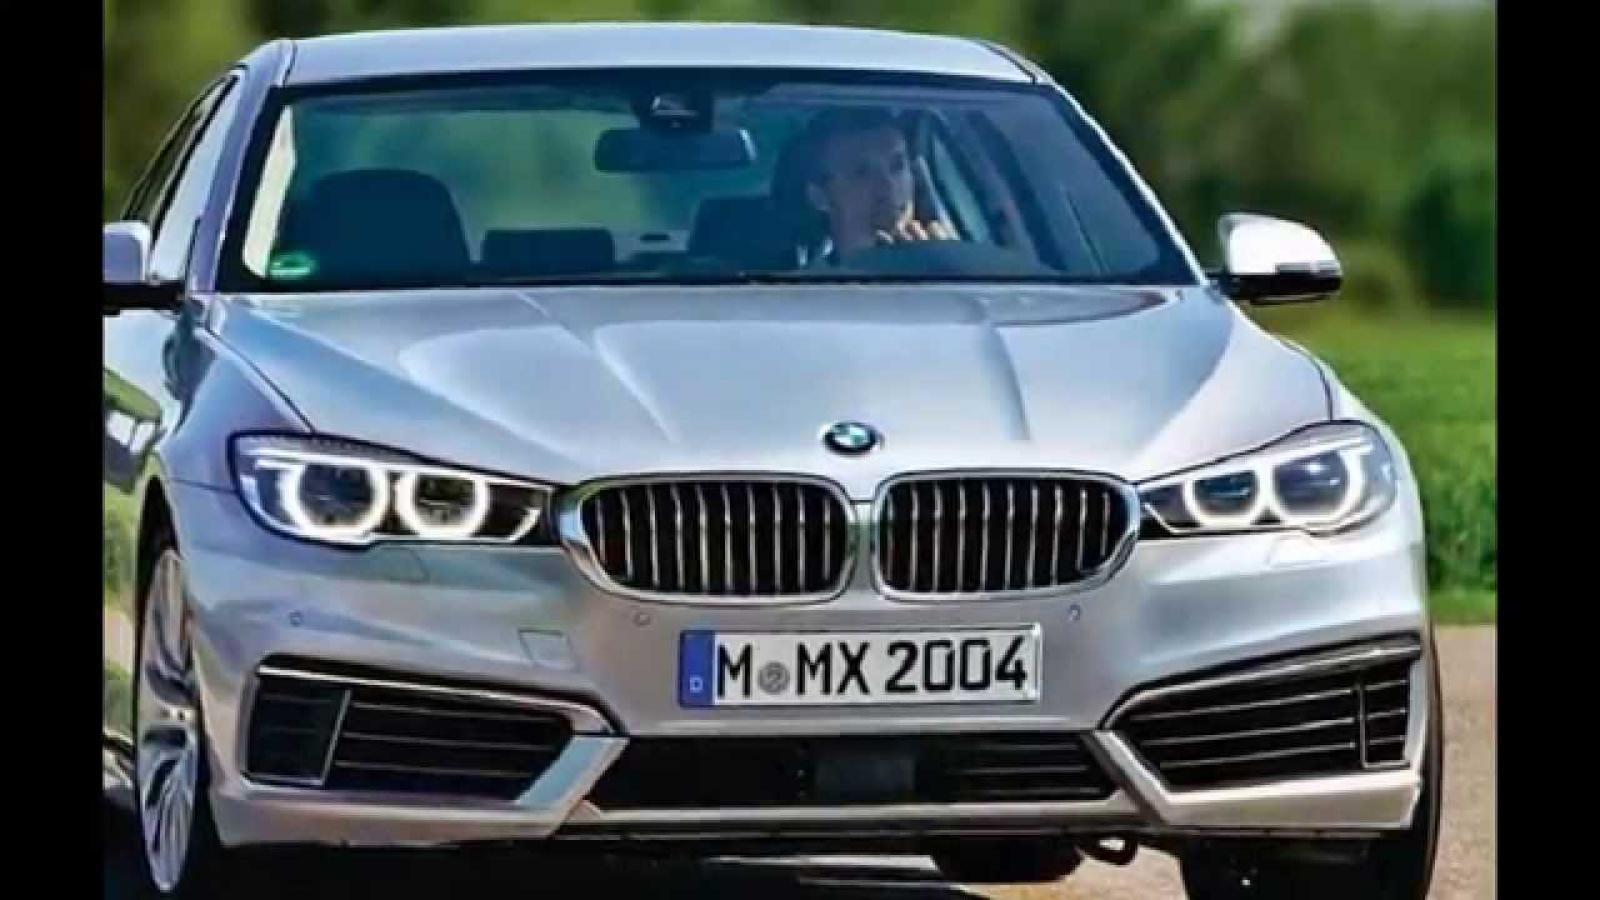 800 1024 1280 1600 Origin 2015 BMW ...